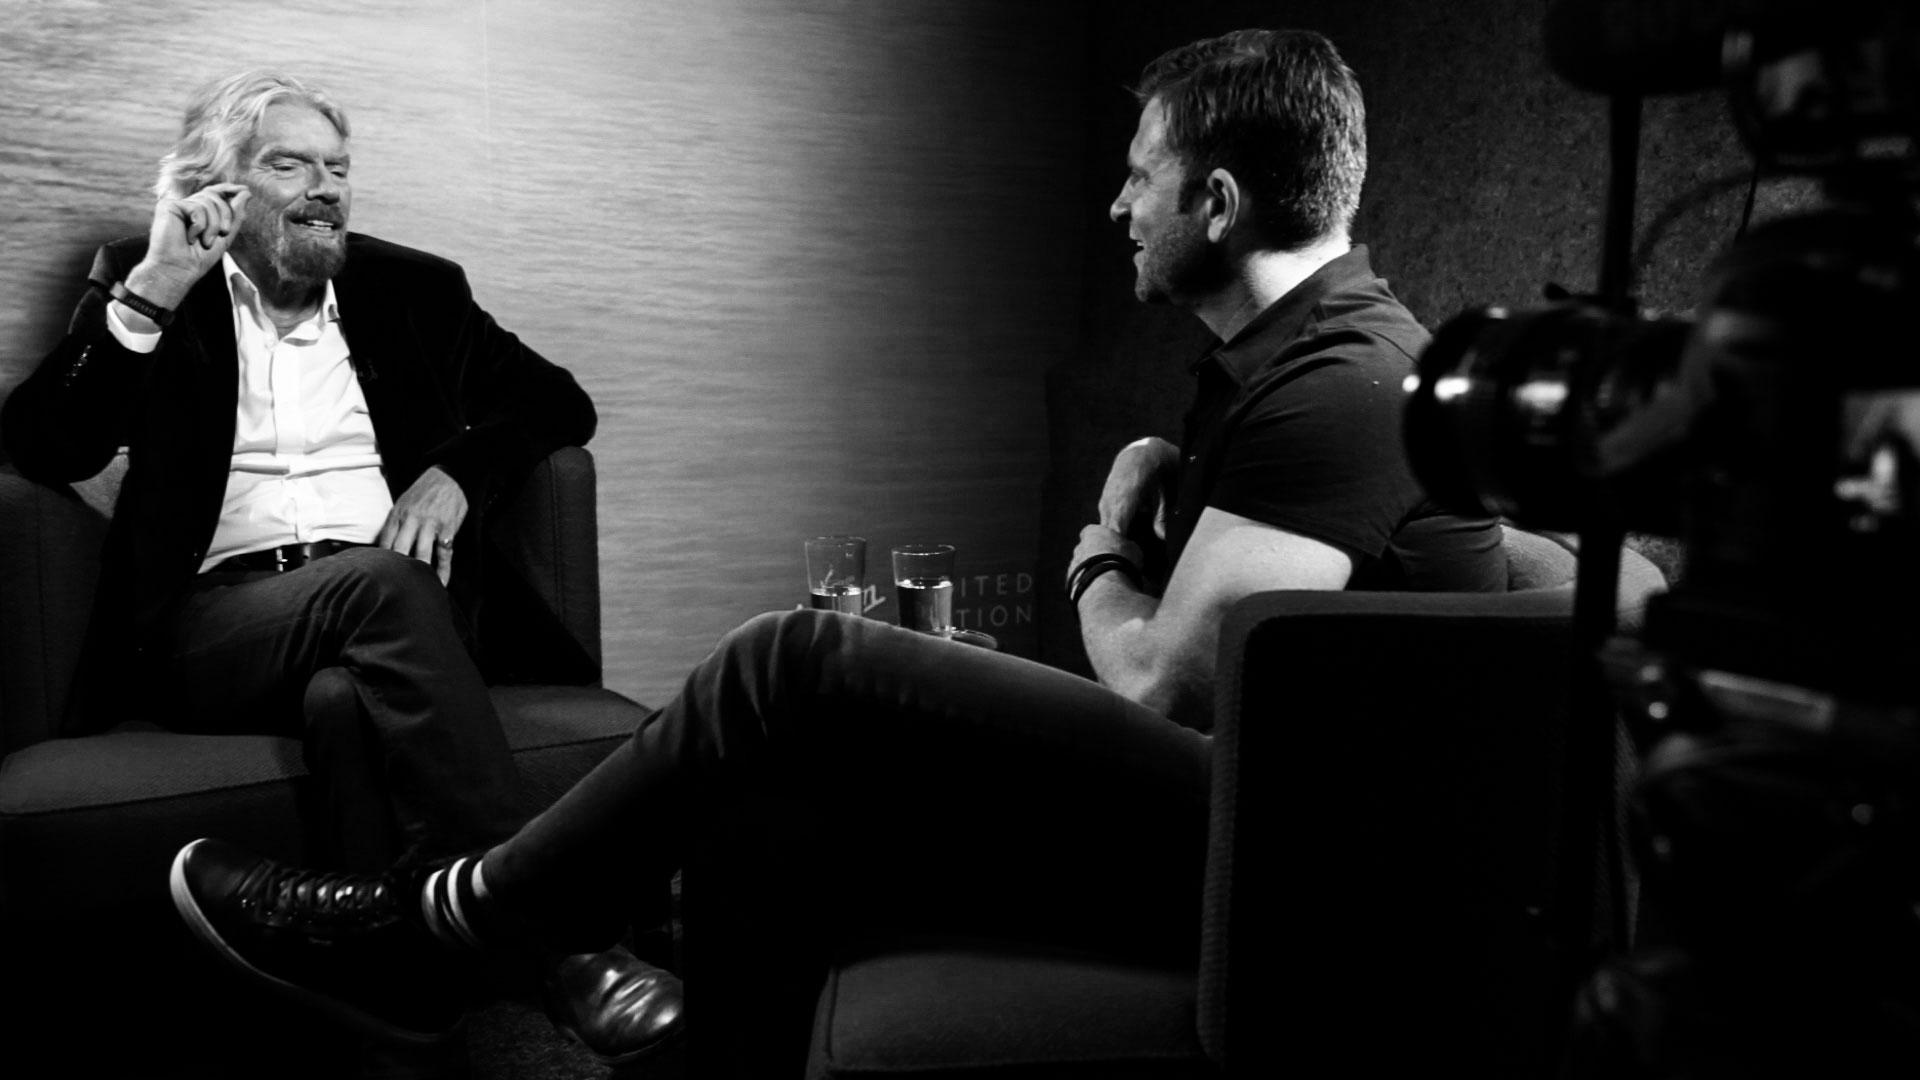 Richard Branson on the set of 30 Days of Genius on CreativeLive